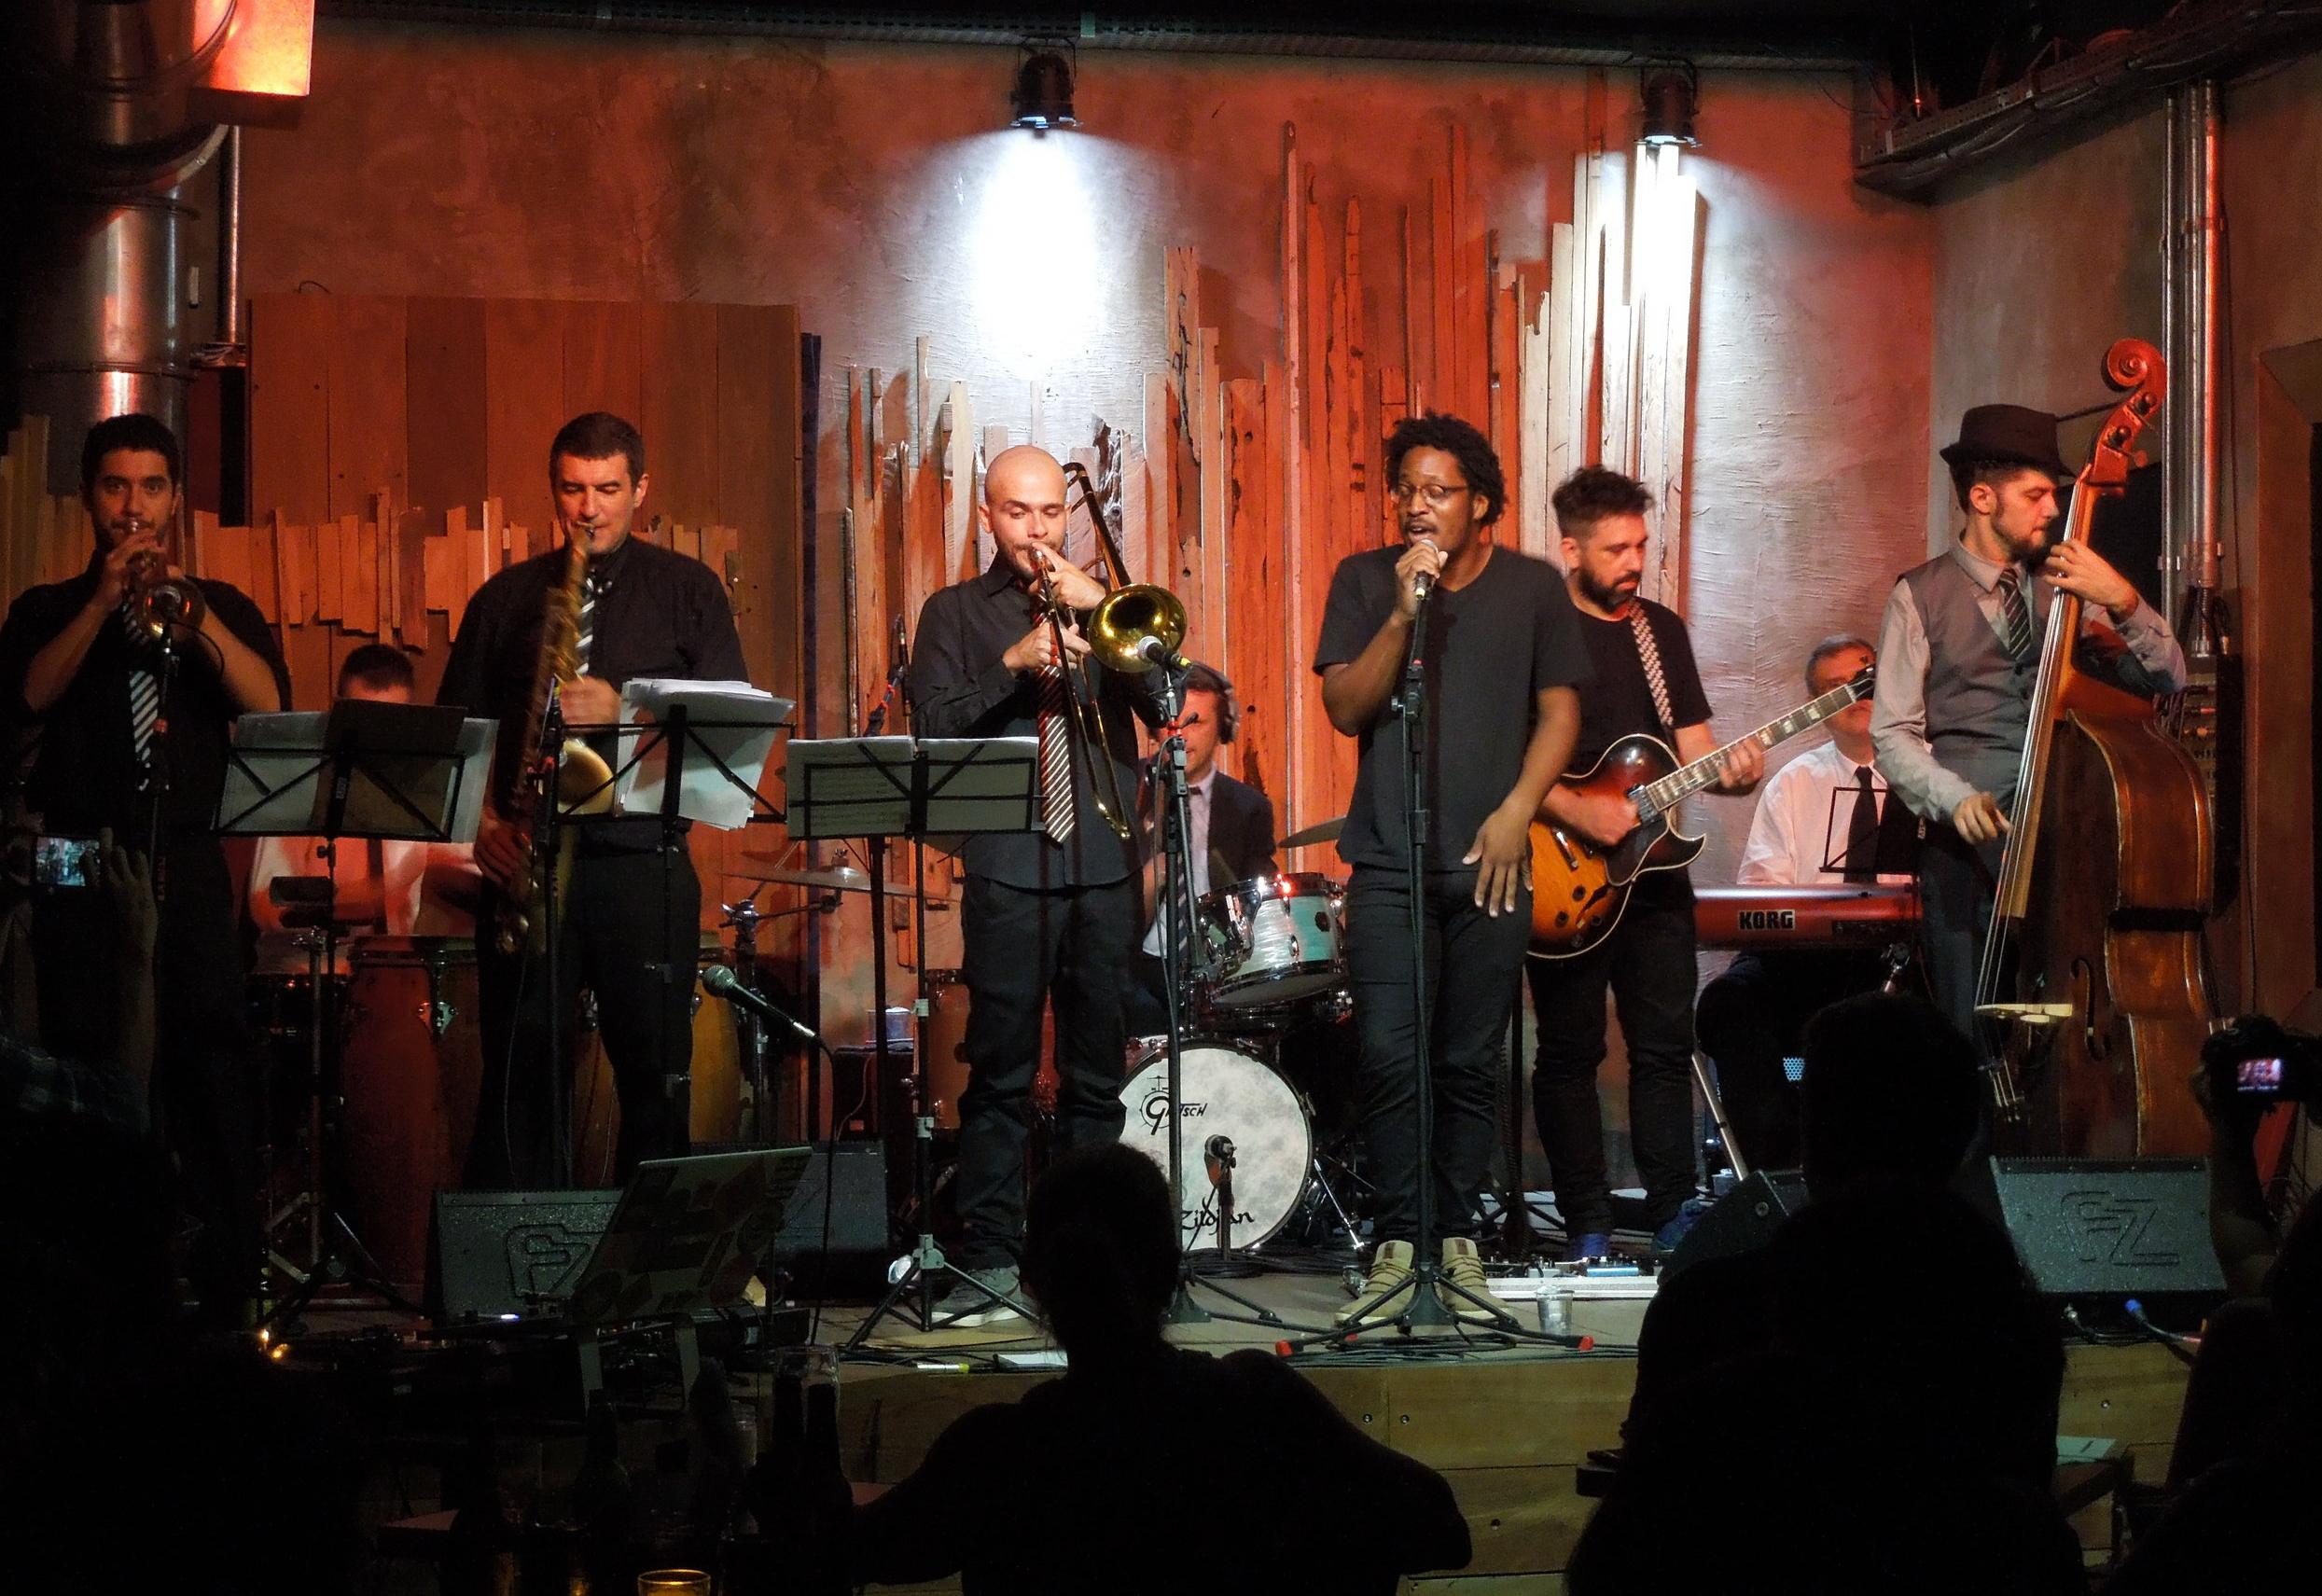 Radio Stevie with Superjazz Collective at Jazz Nos Fundos, a trendy jazz bar in São Paulo, Brazil.